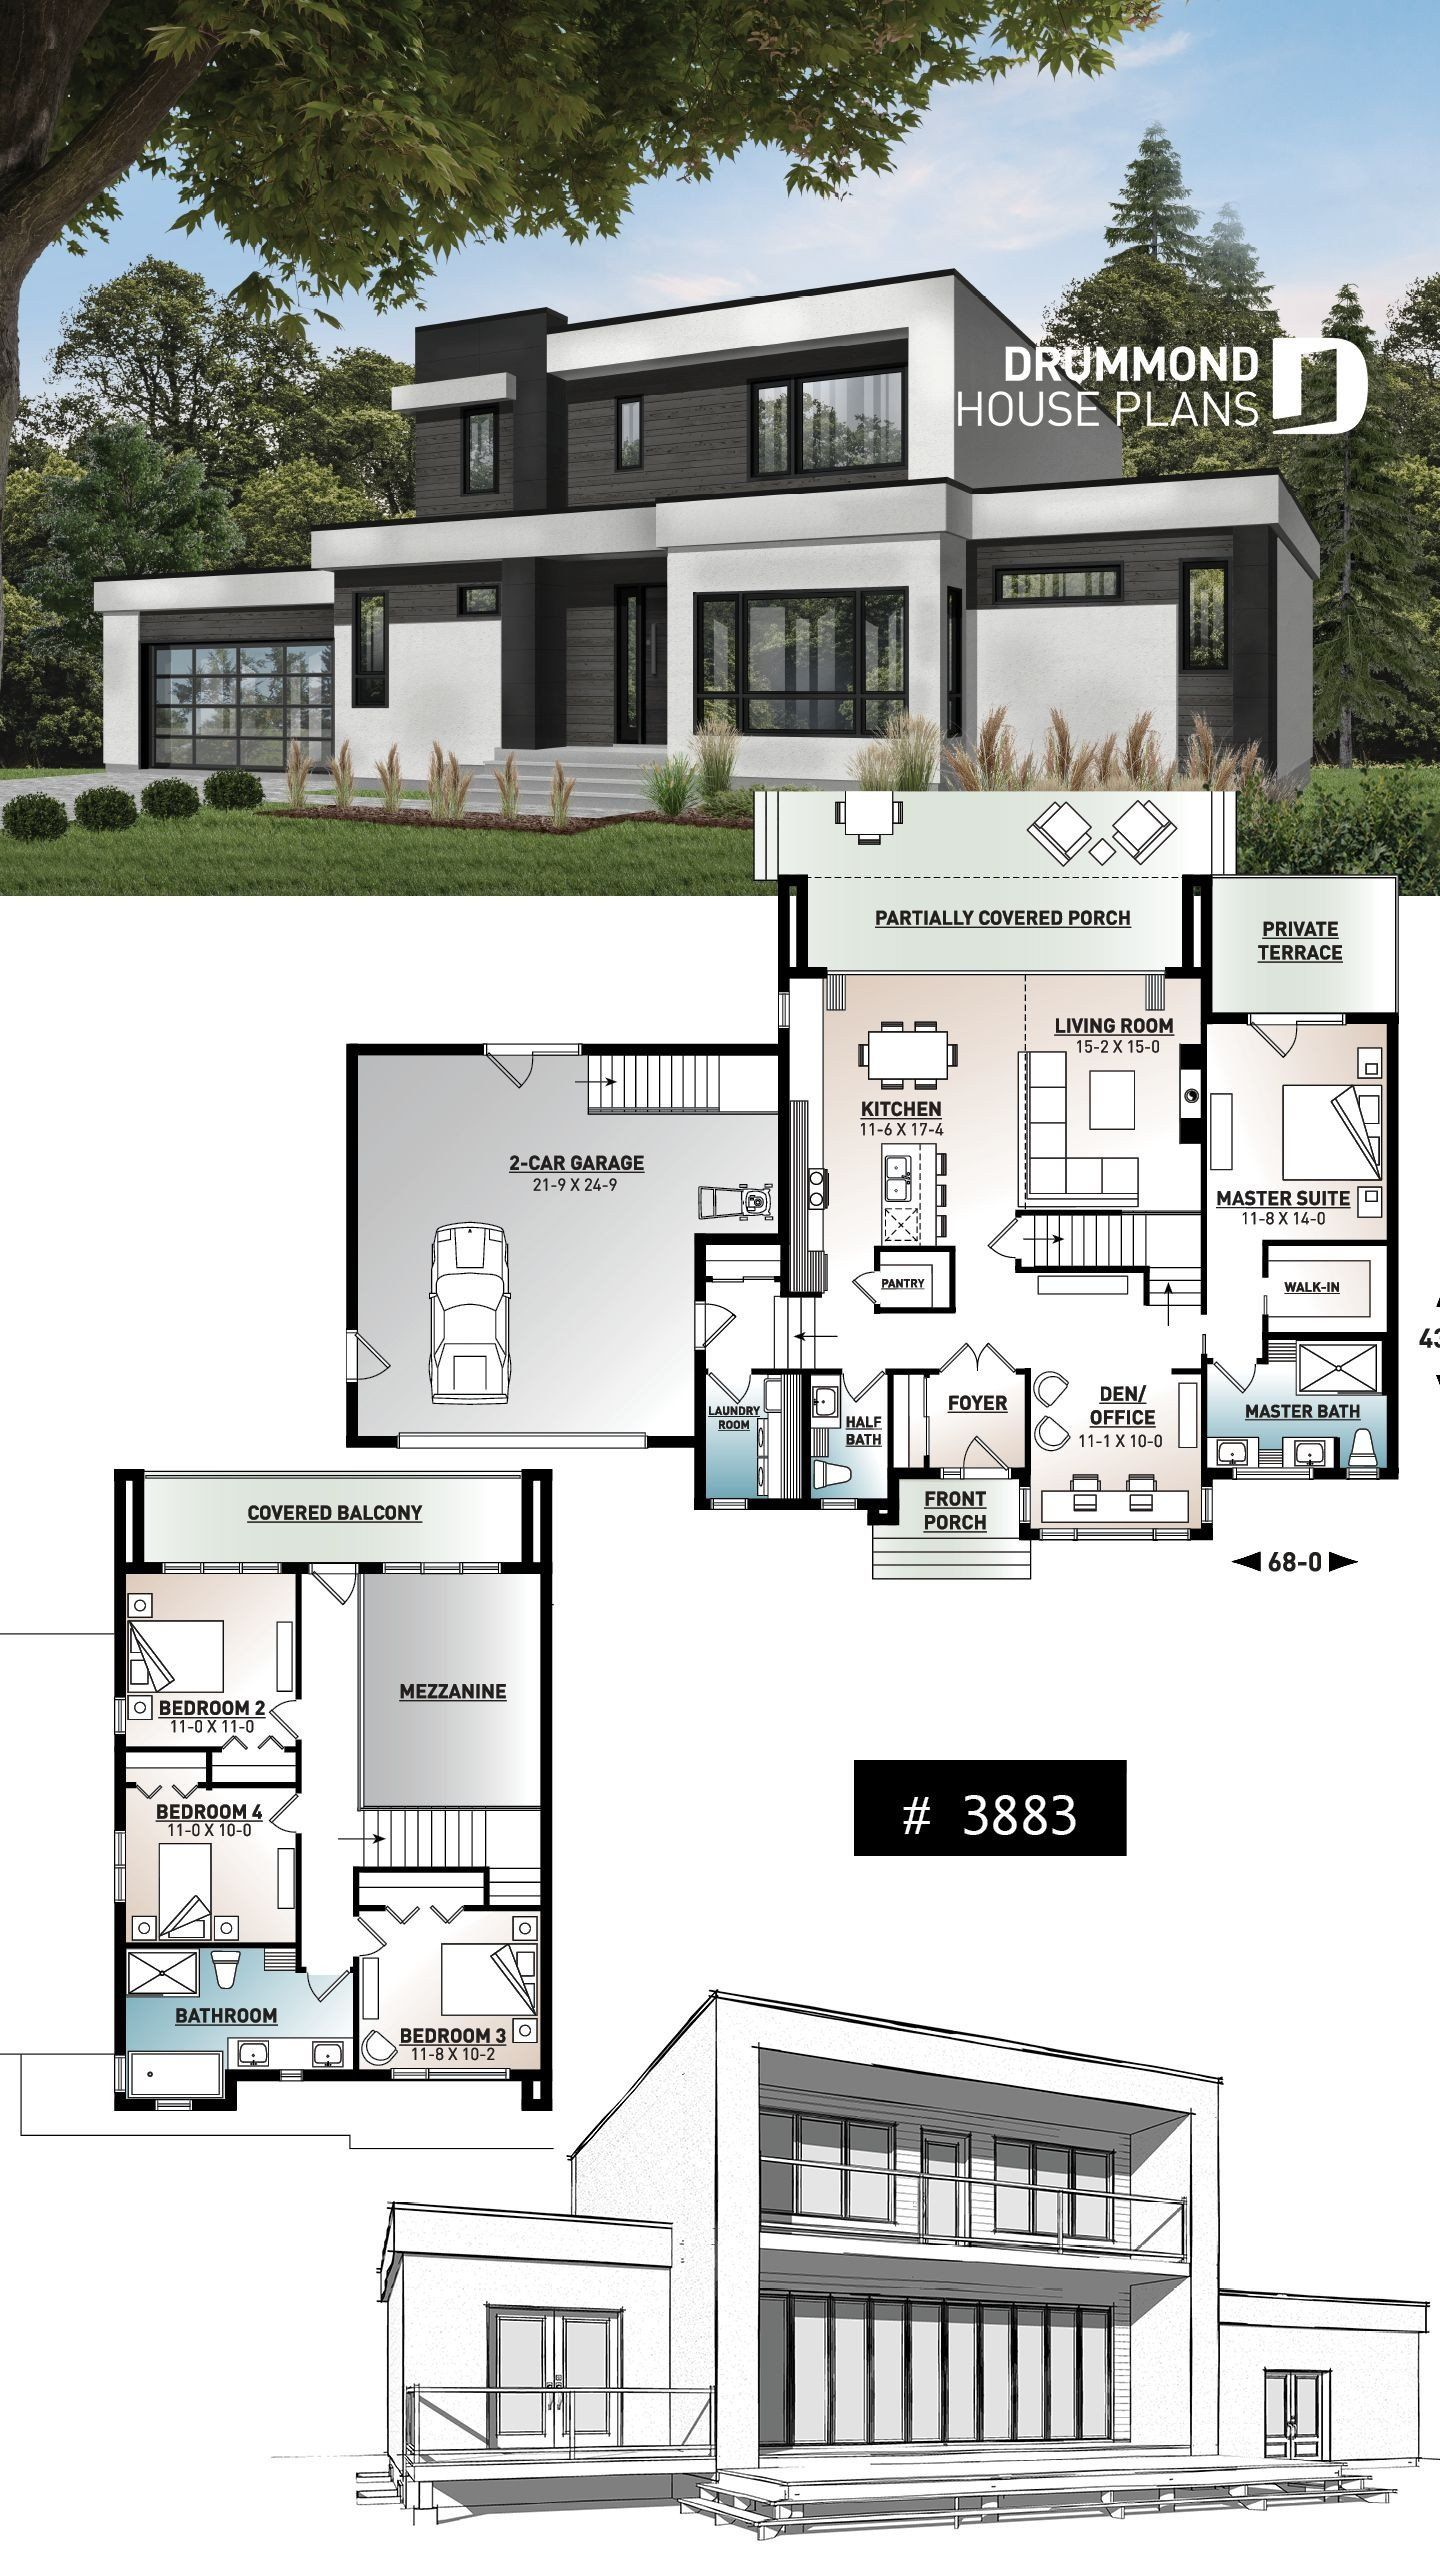 Modern House Designs Floor Plans House Plan Es No 3883 In 2020 Modern House Floor Plans Modern Architecture House Contemporary House Plans